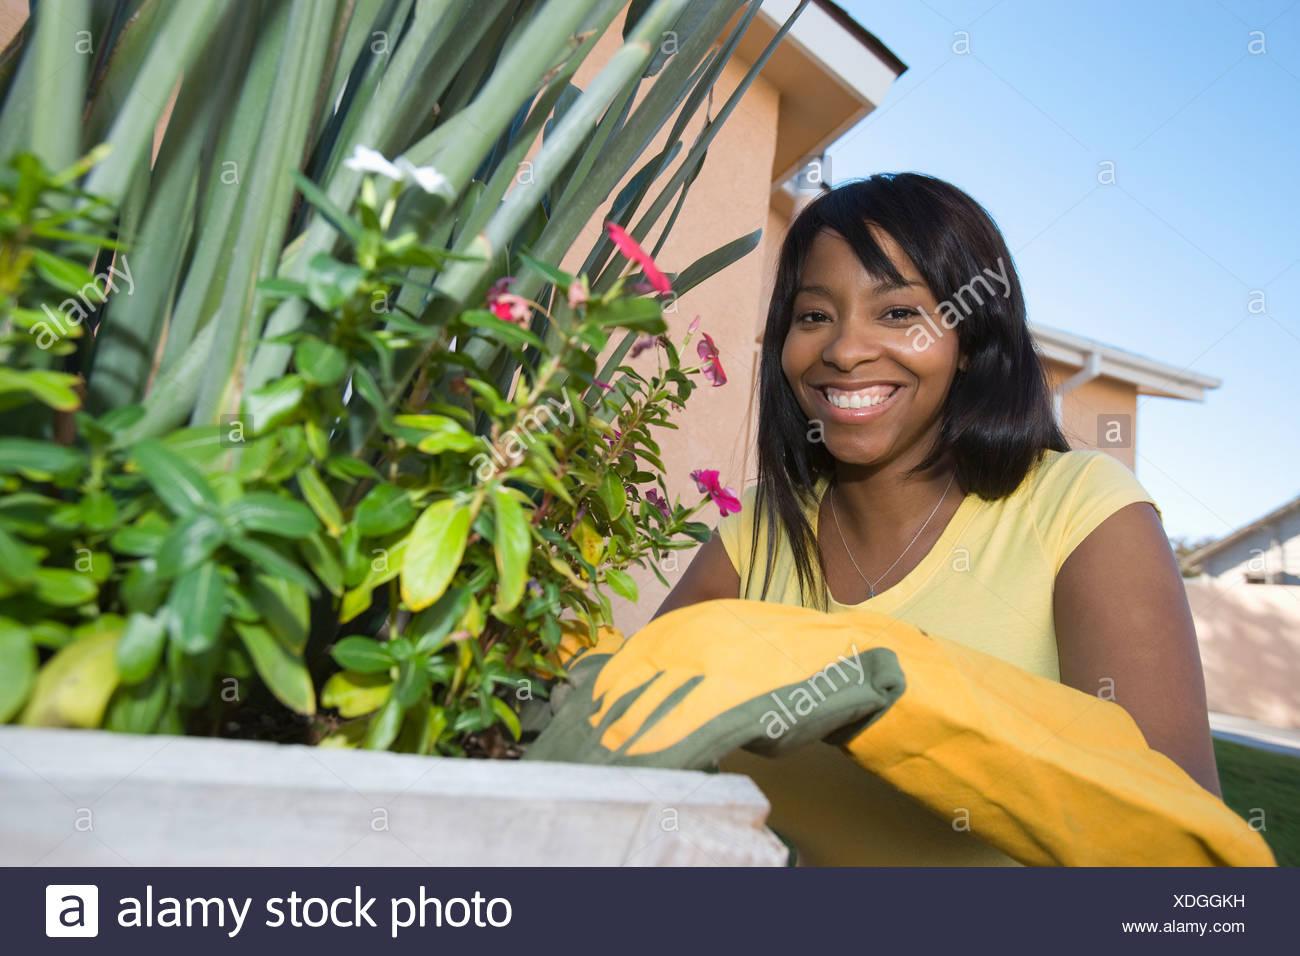 Woman tending plants - Stock Image